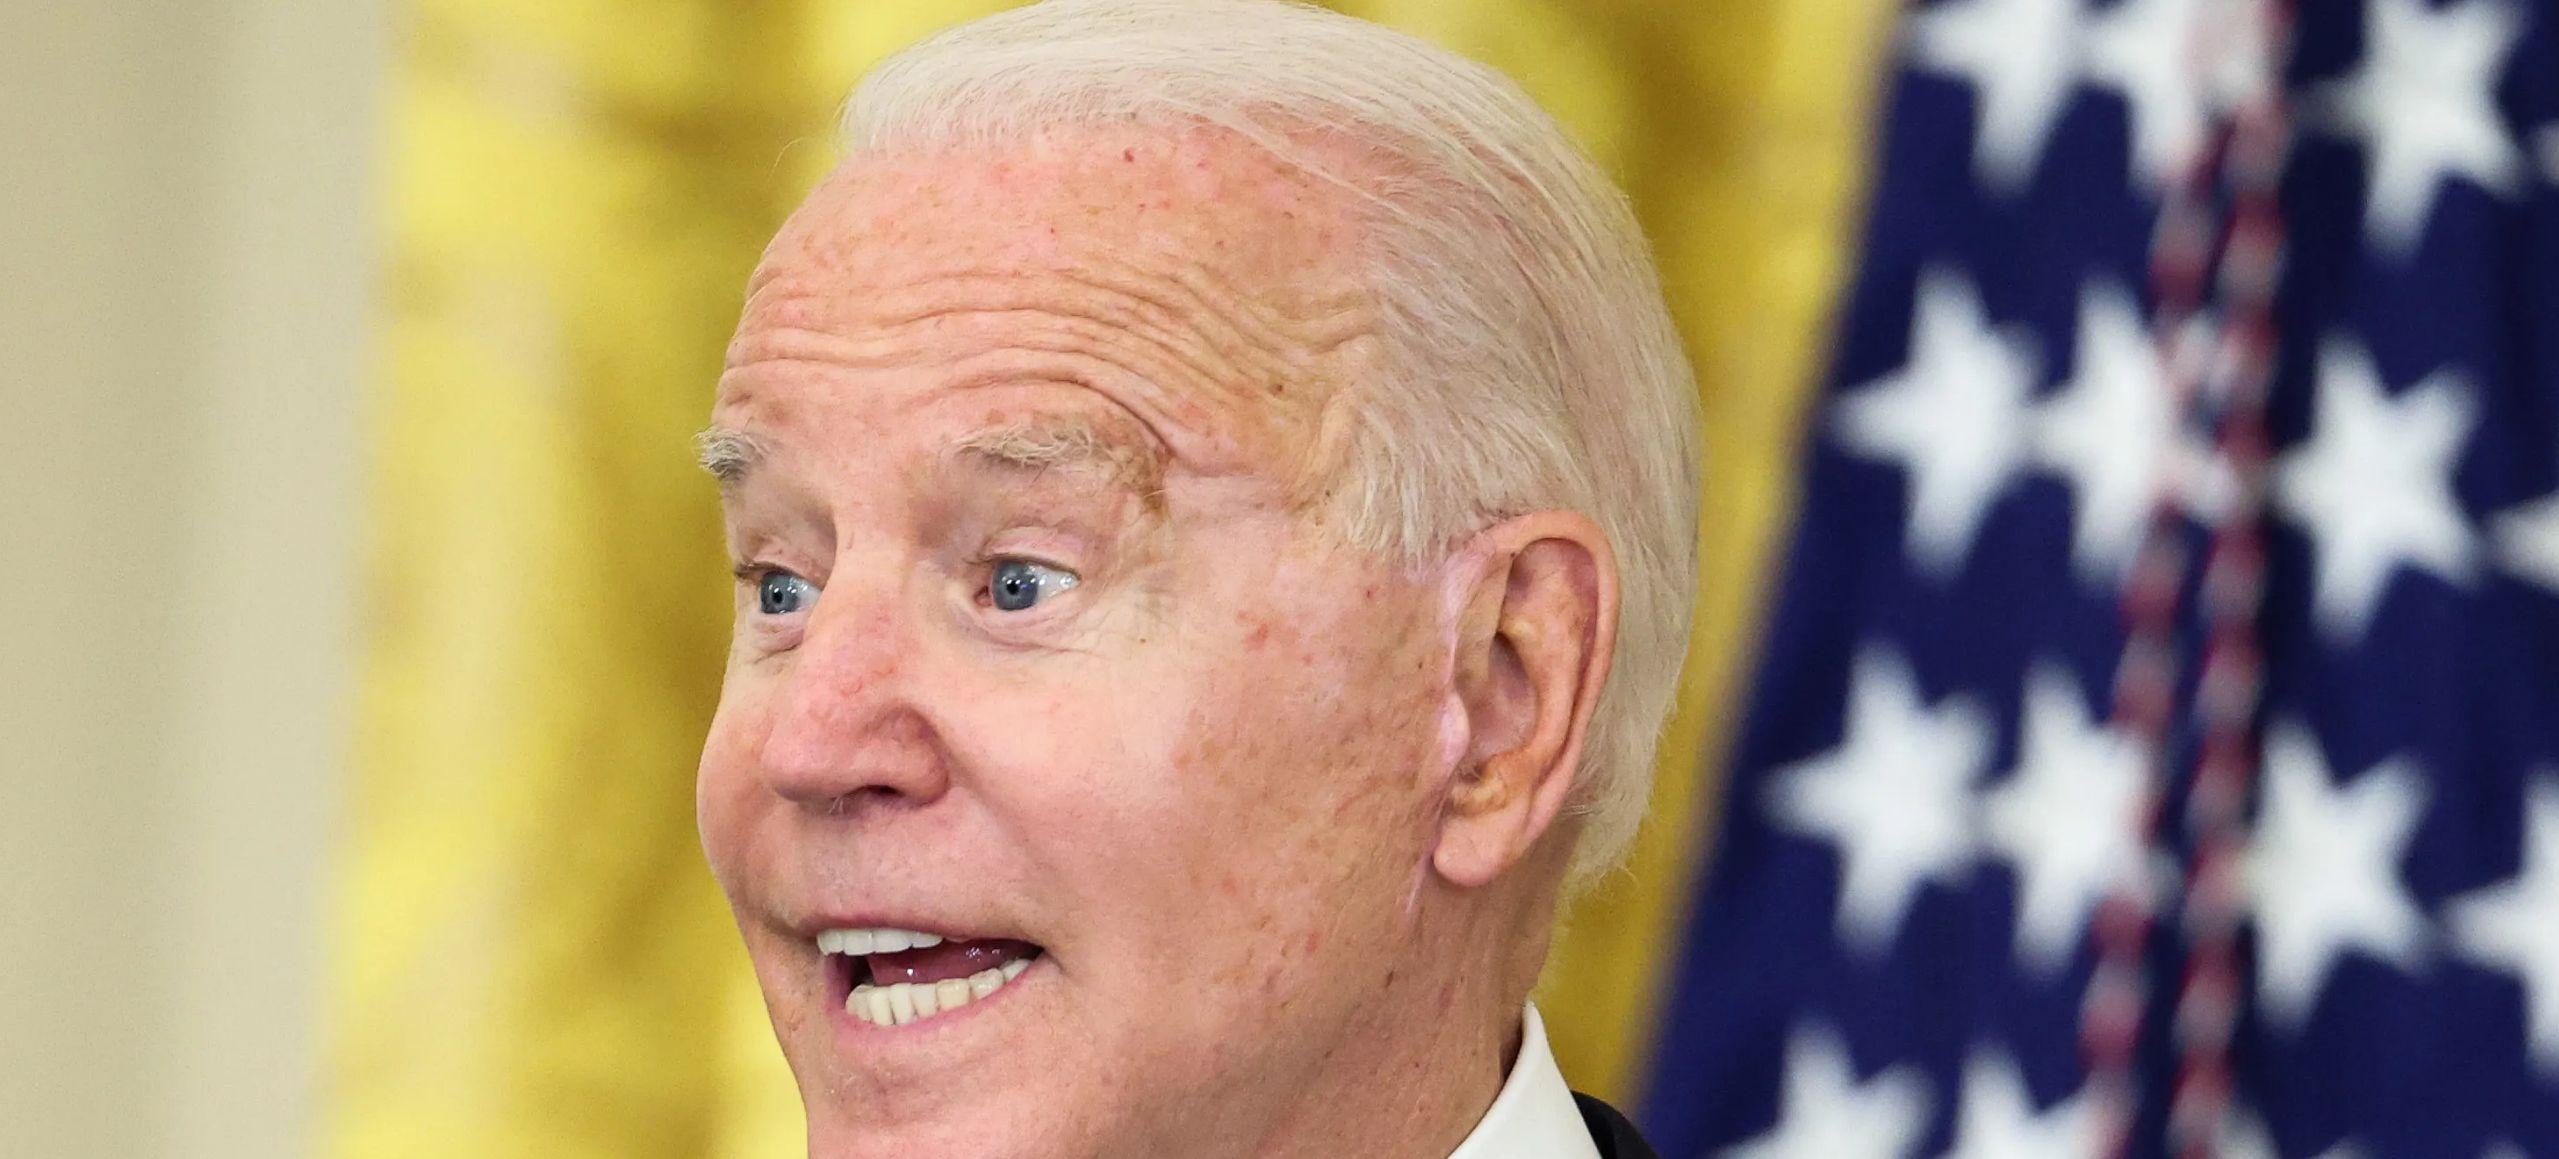 President Joe Biden speaks at a press conference.